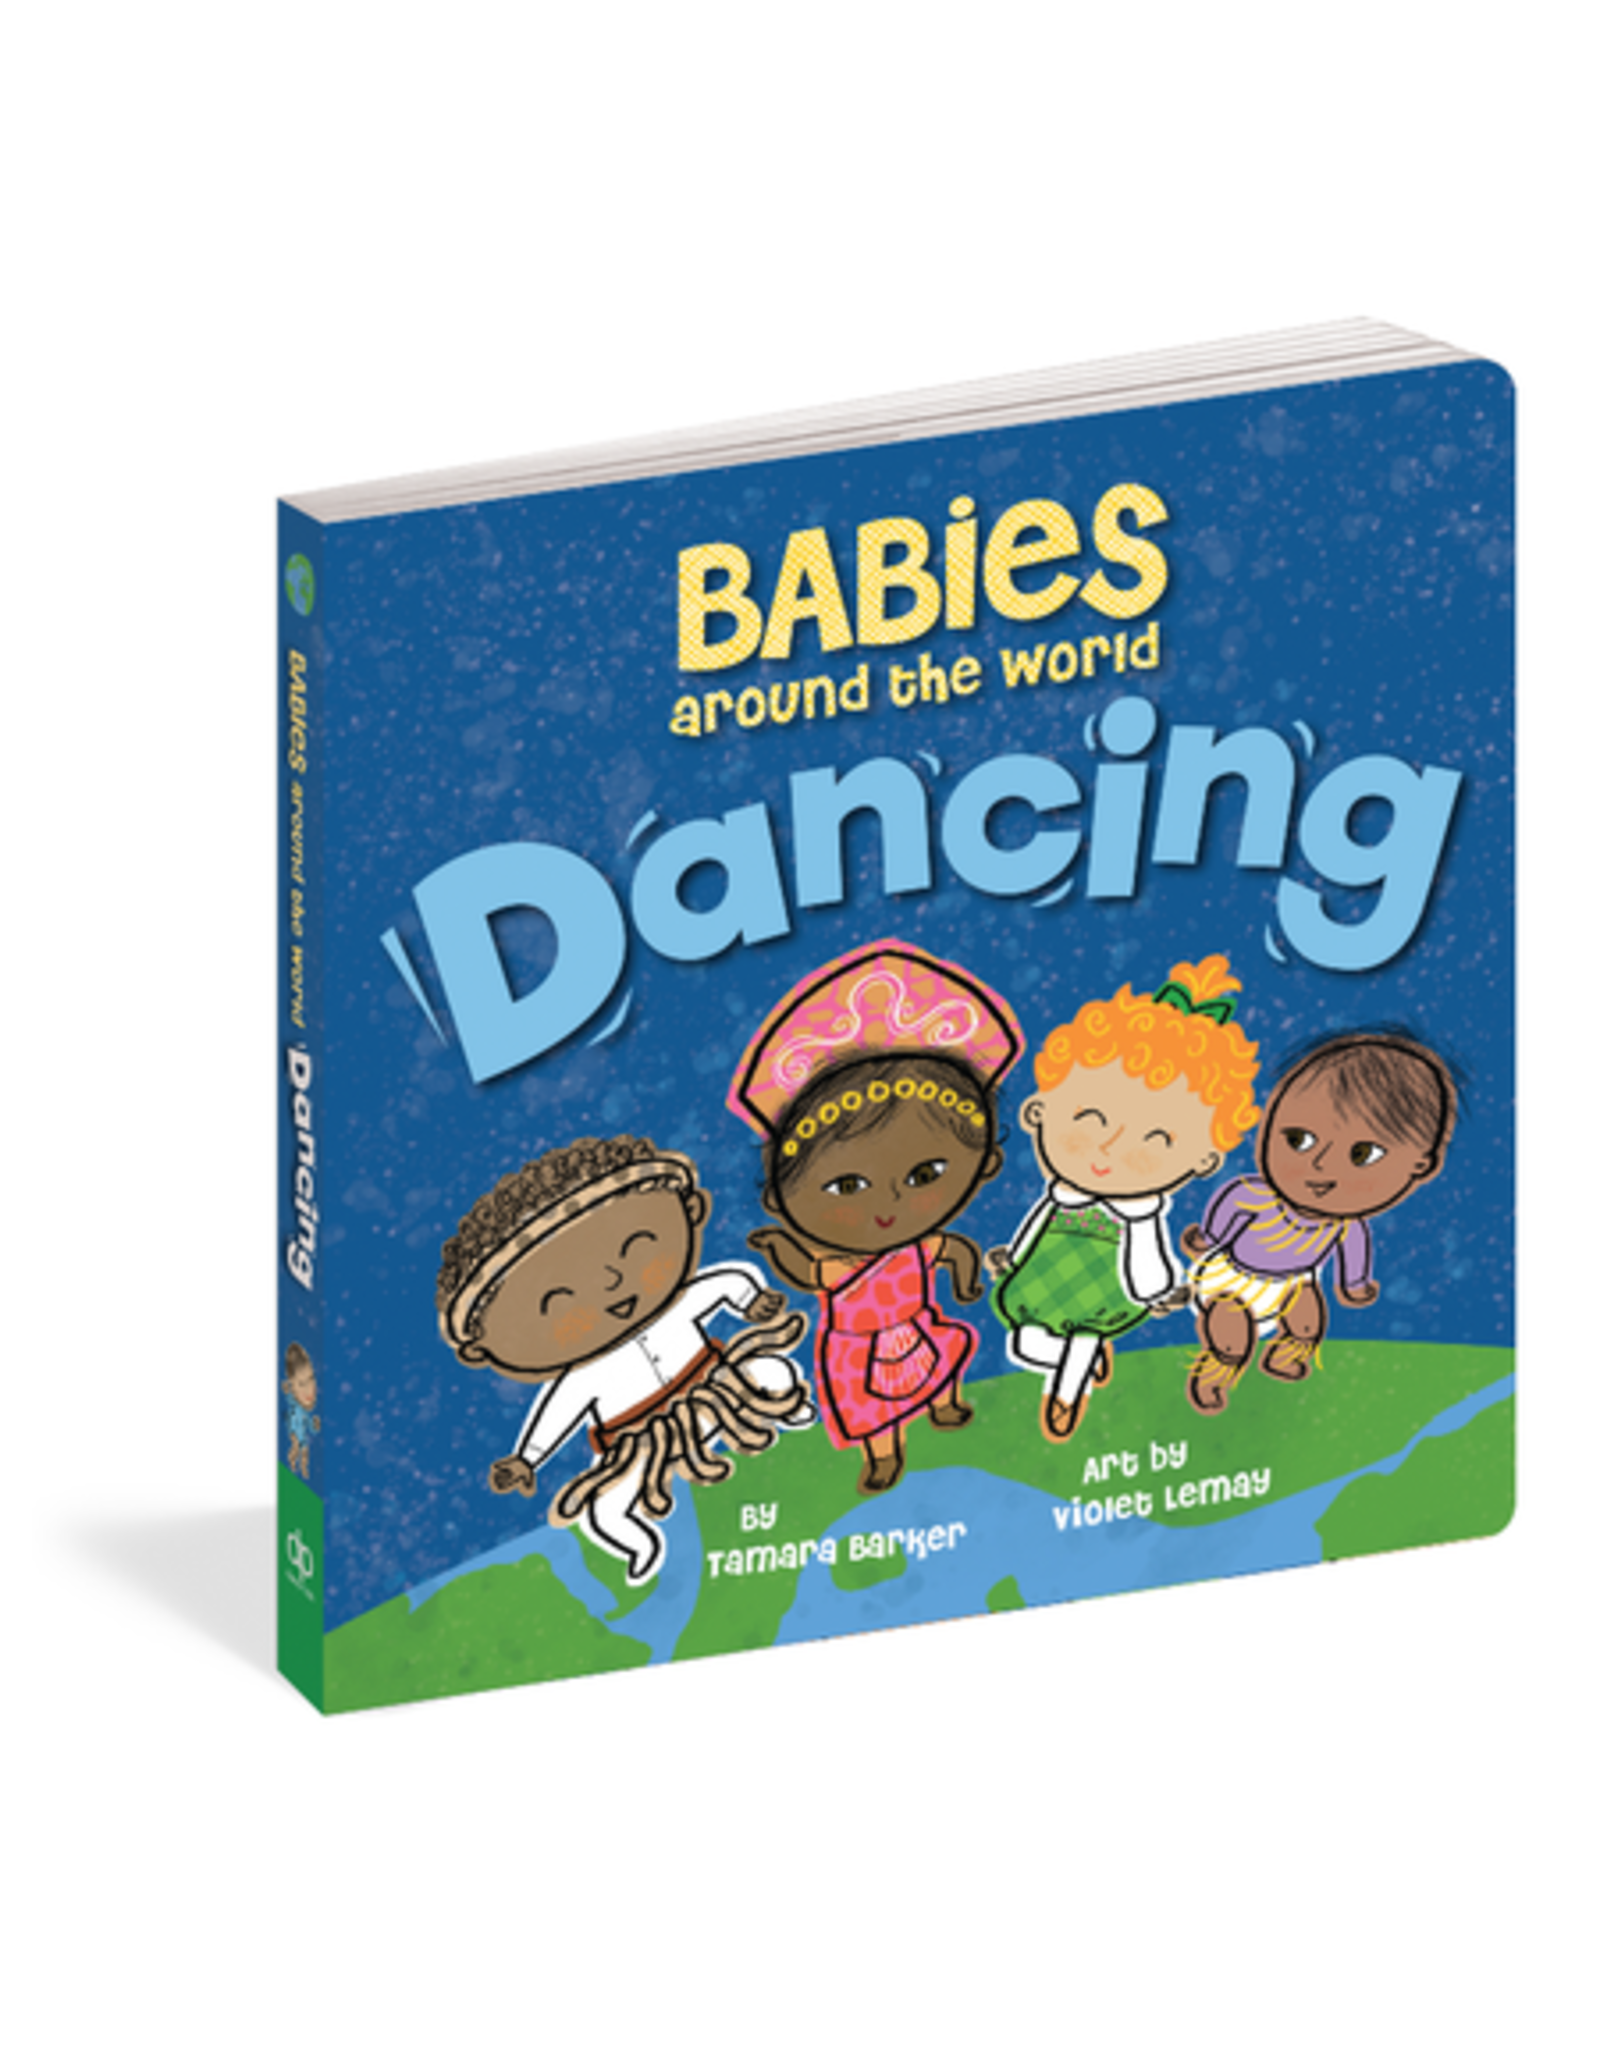 Babies Around the World Dancing by Tamara Barker